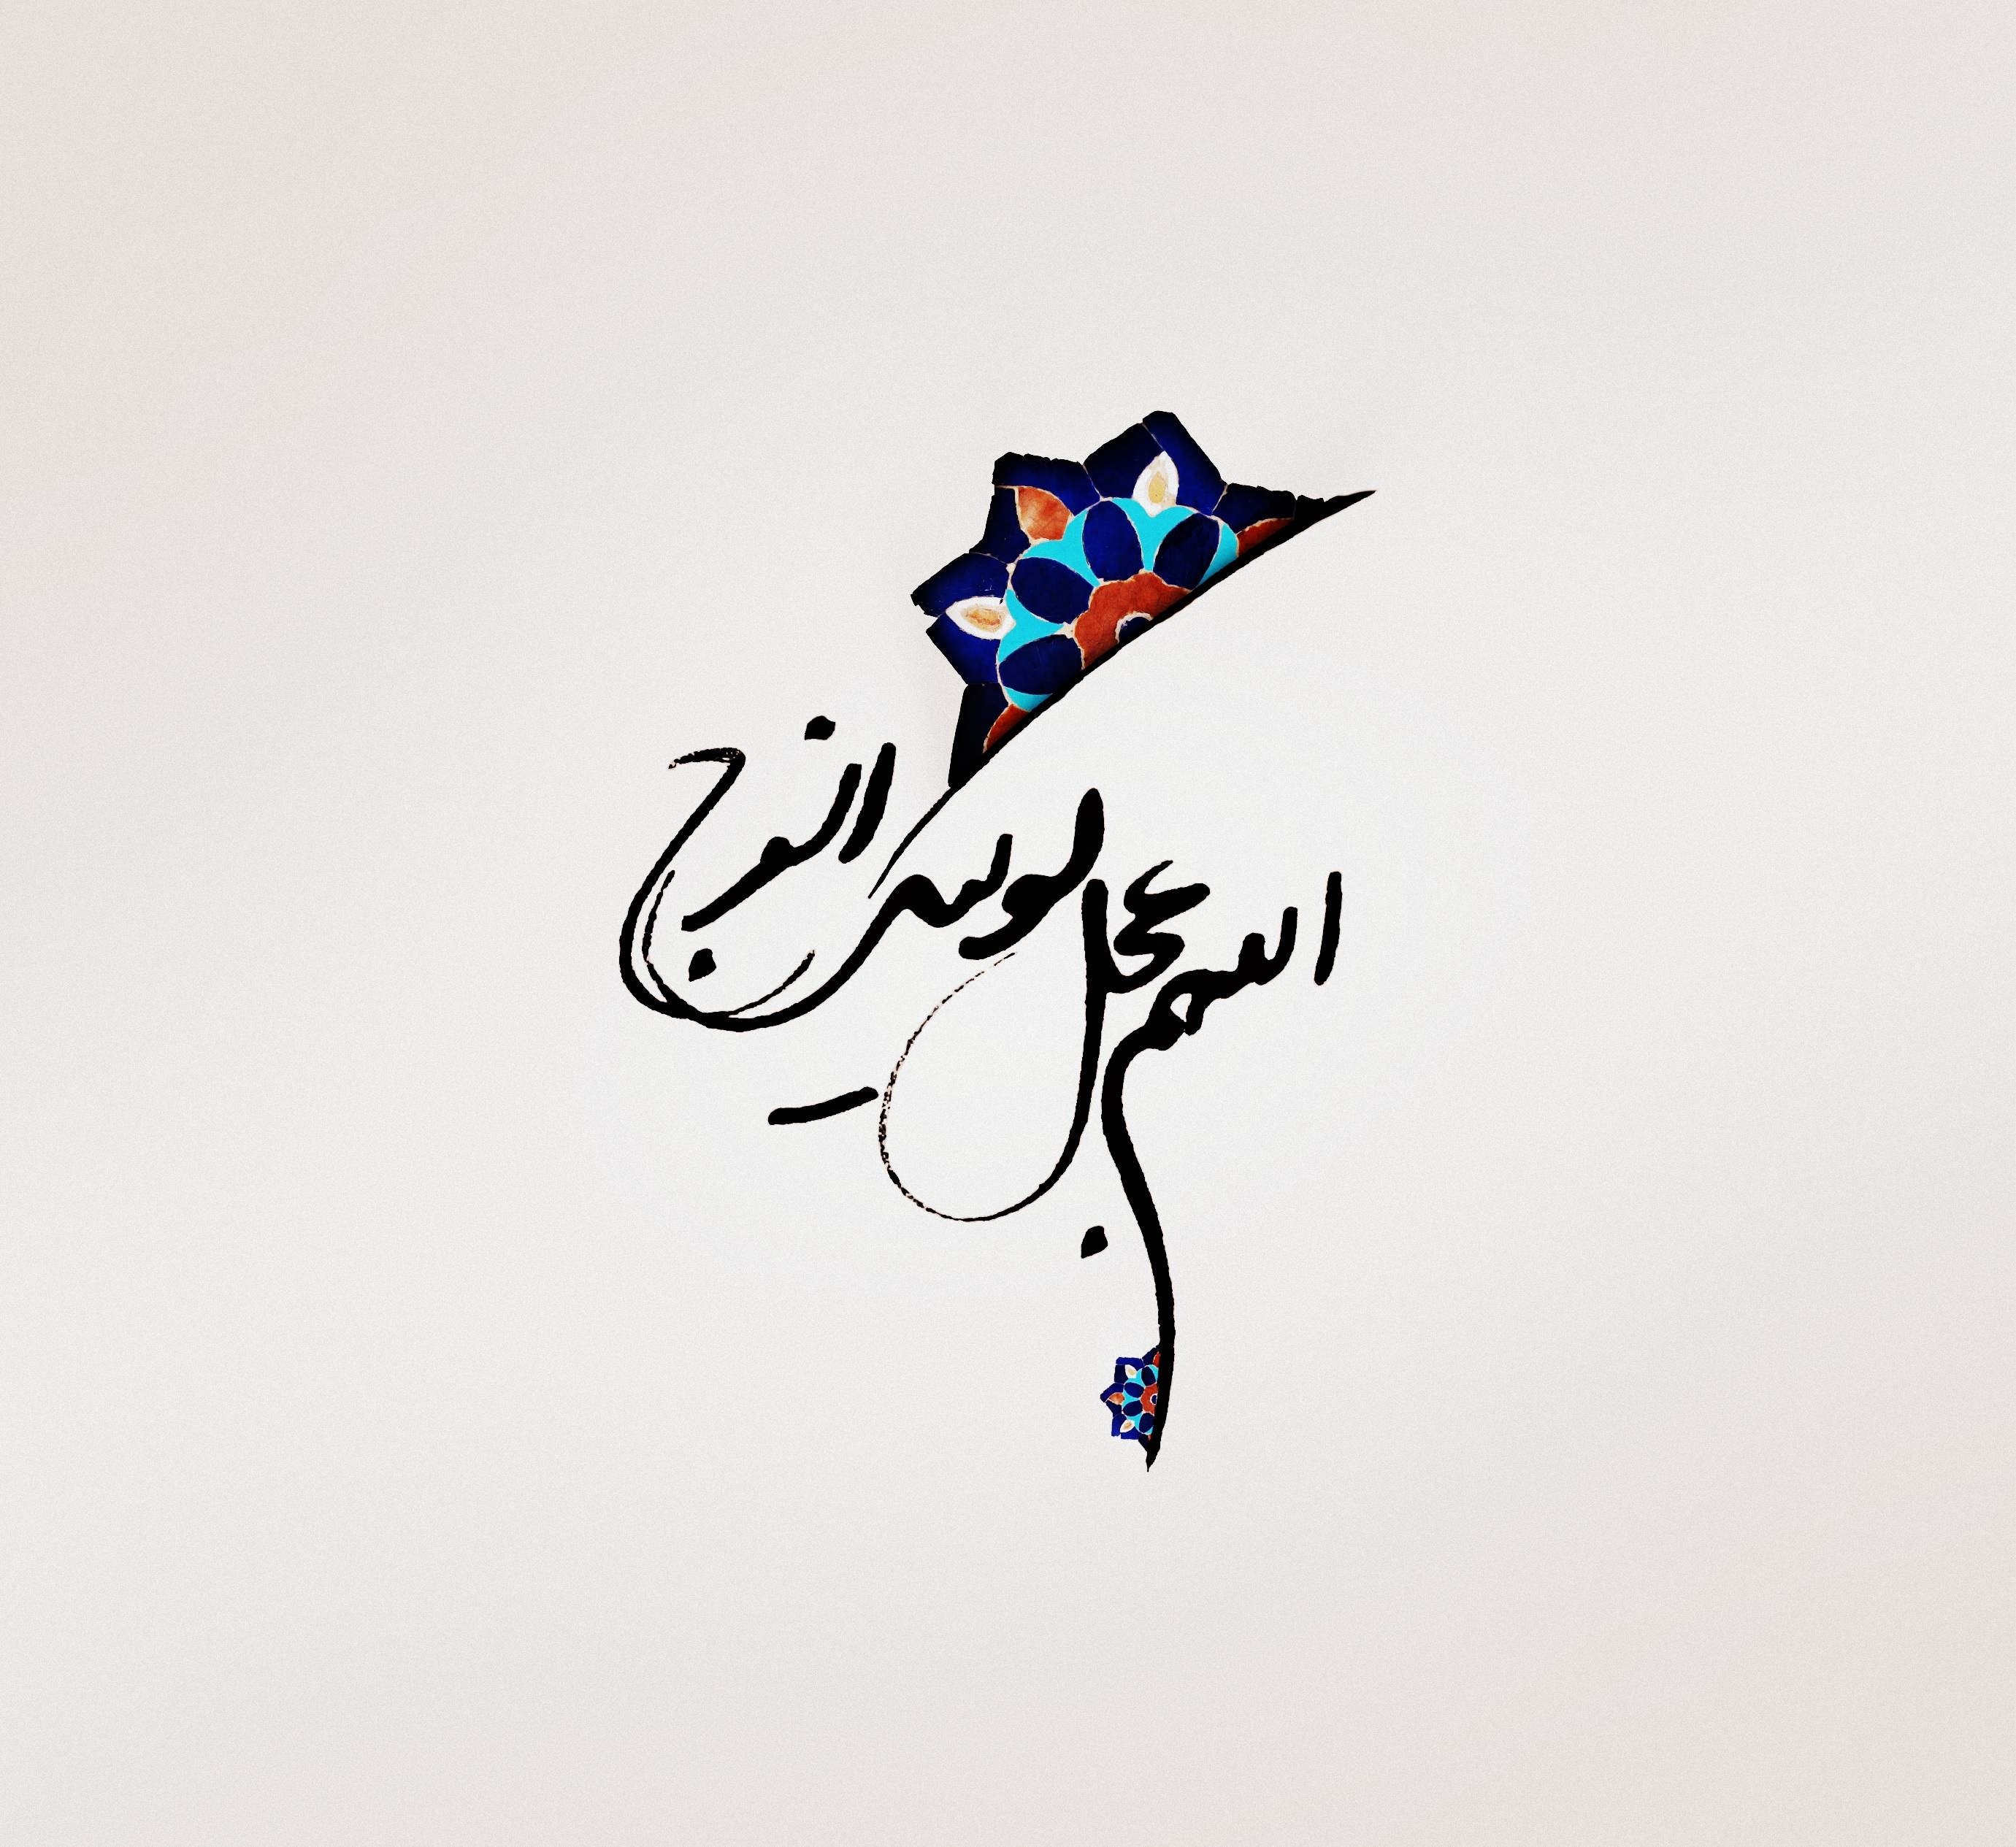 http://bayanbox.ir/view/55549888427246367/zohor036-001.jpg